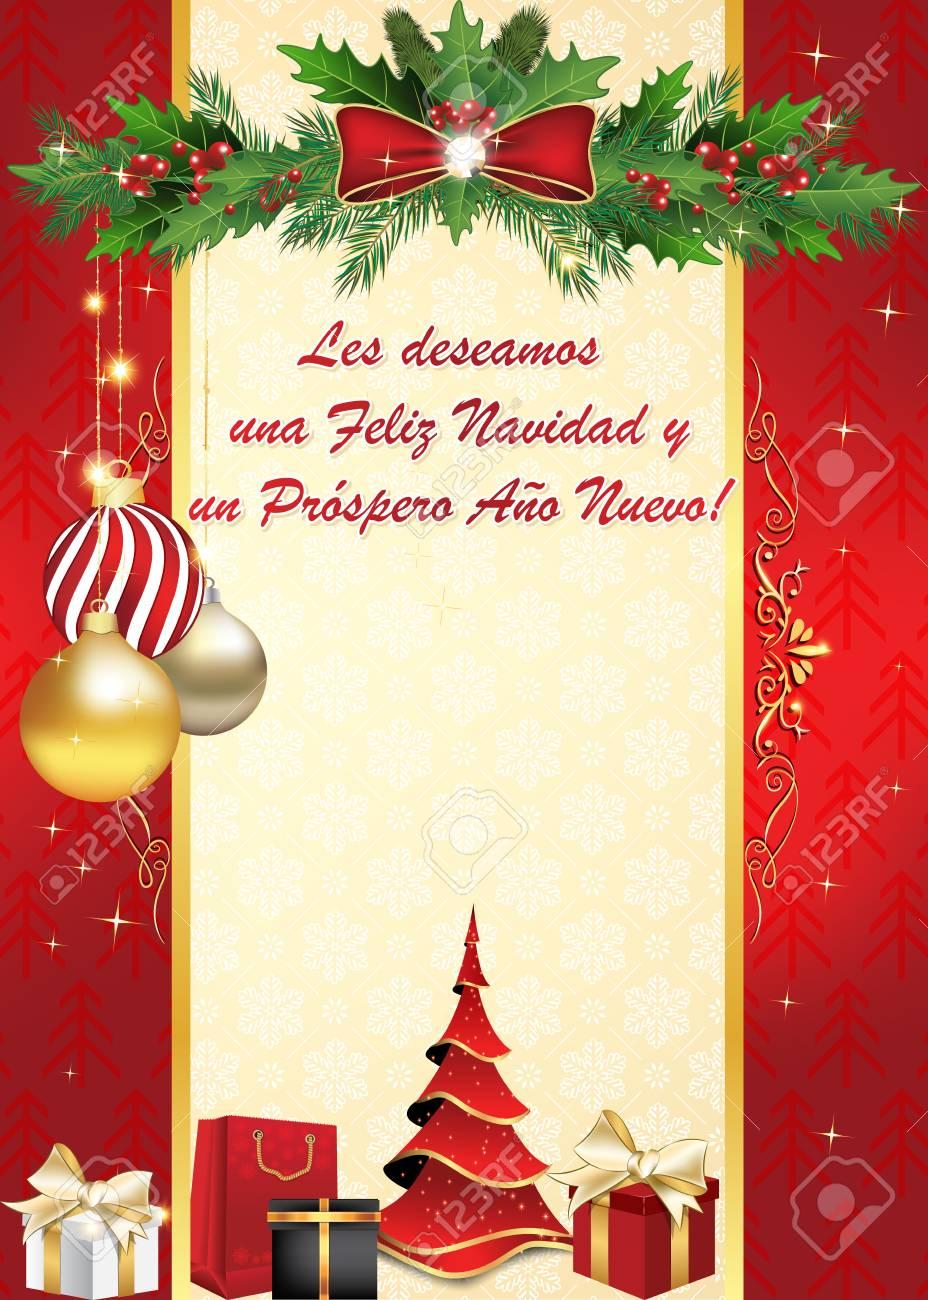 Merry Christmas In Spanish.We Wish You Merry Christmas And Happy New Year Spanish Language